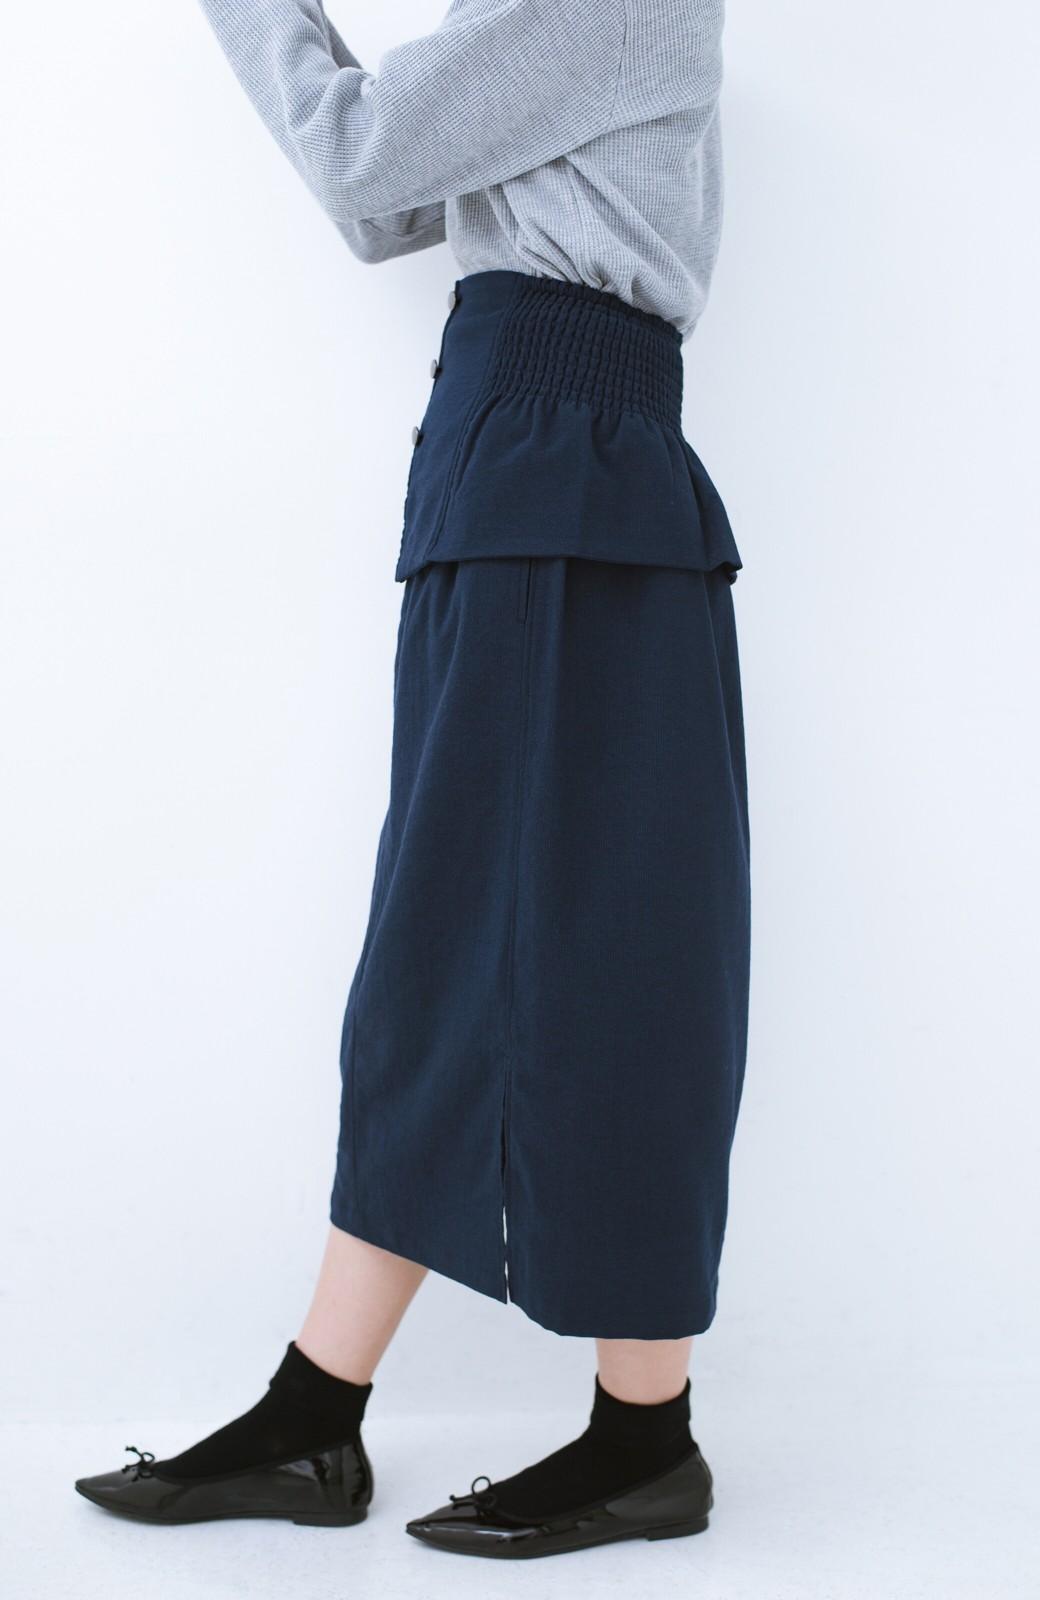 haco!  腹巻きとは呼ばせない ブルー期も華やかに過ごせる消臭加工裏地付きフリルデザインスカートセット【ブルー期】女の子バンザイ!プロジェクト <ネイビー>の商品写真12